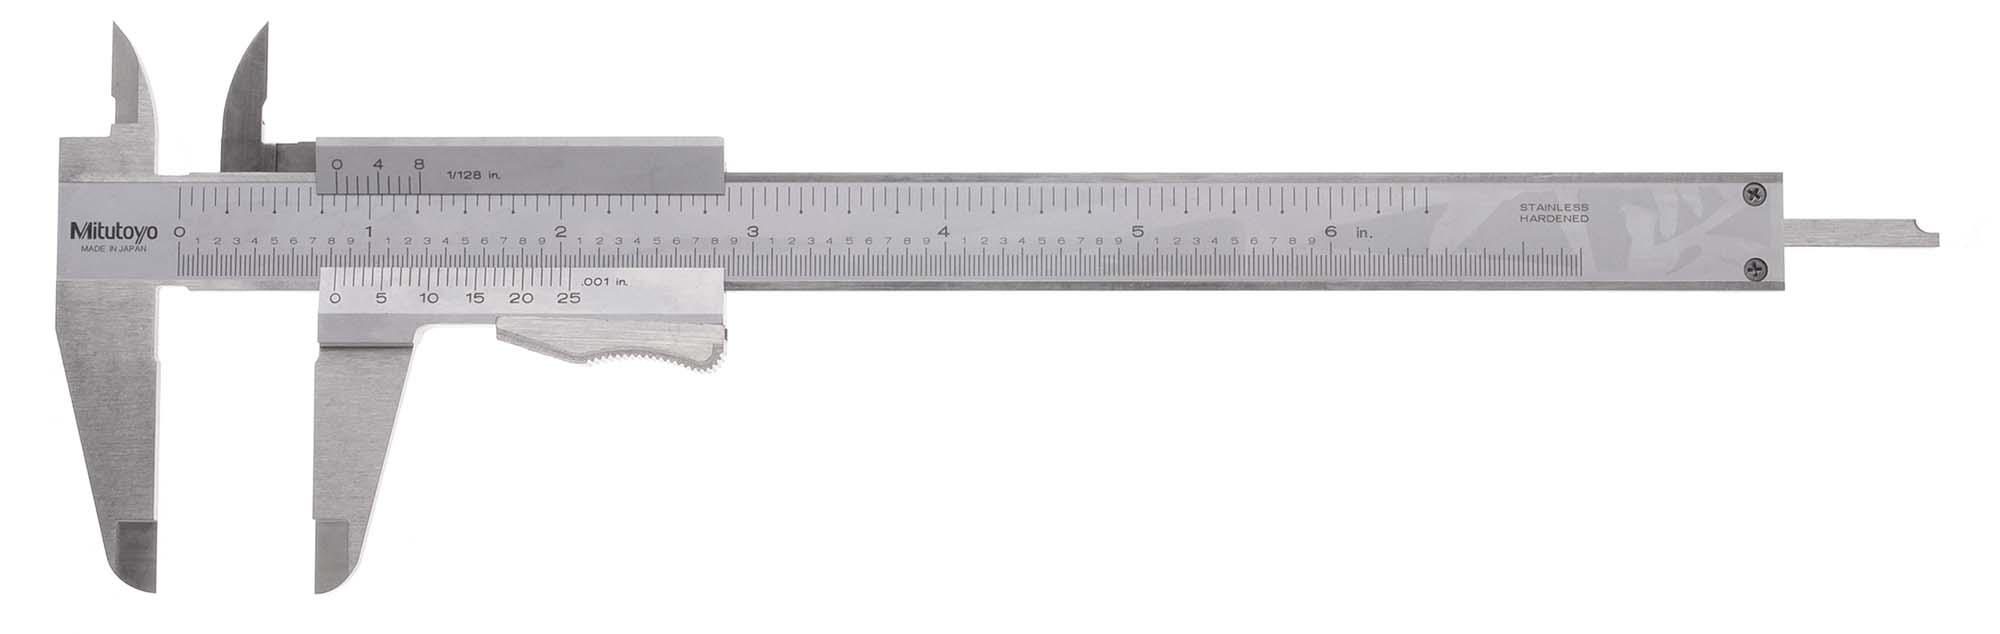 "8"" Mitutoyo 531-114 Vernier Caliper with Thumblock, .001"", 1/128"" (LIMITED QUANTITY)"